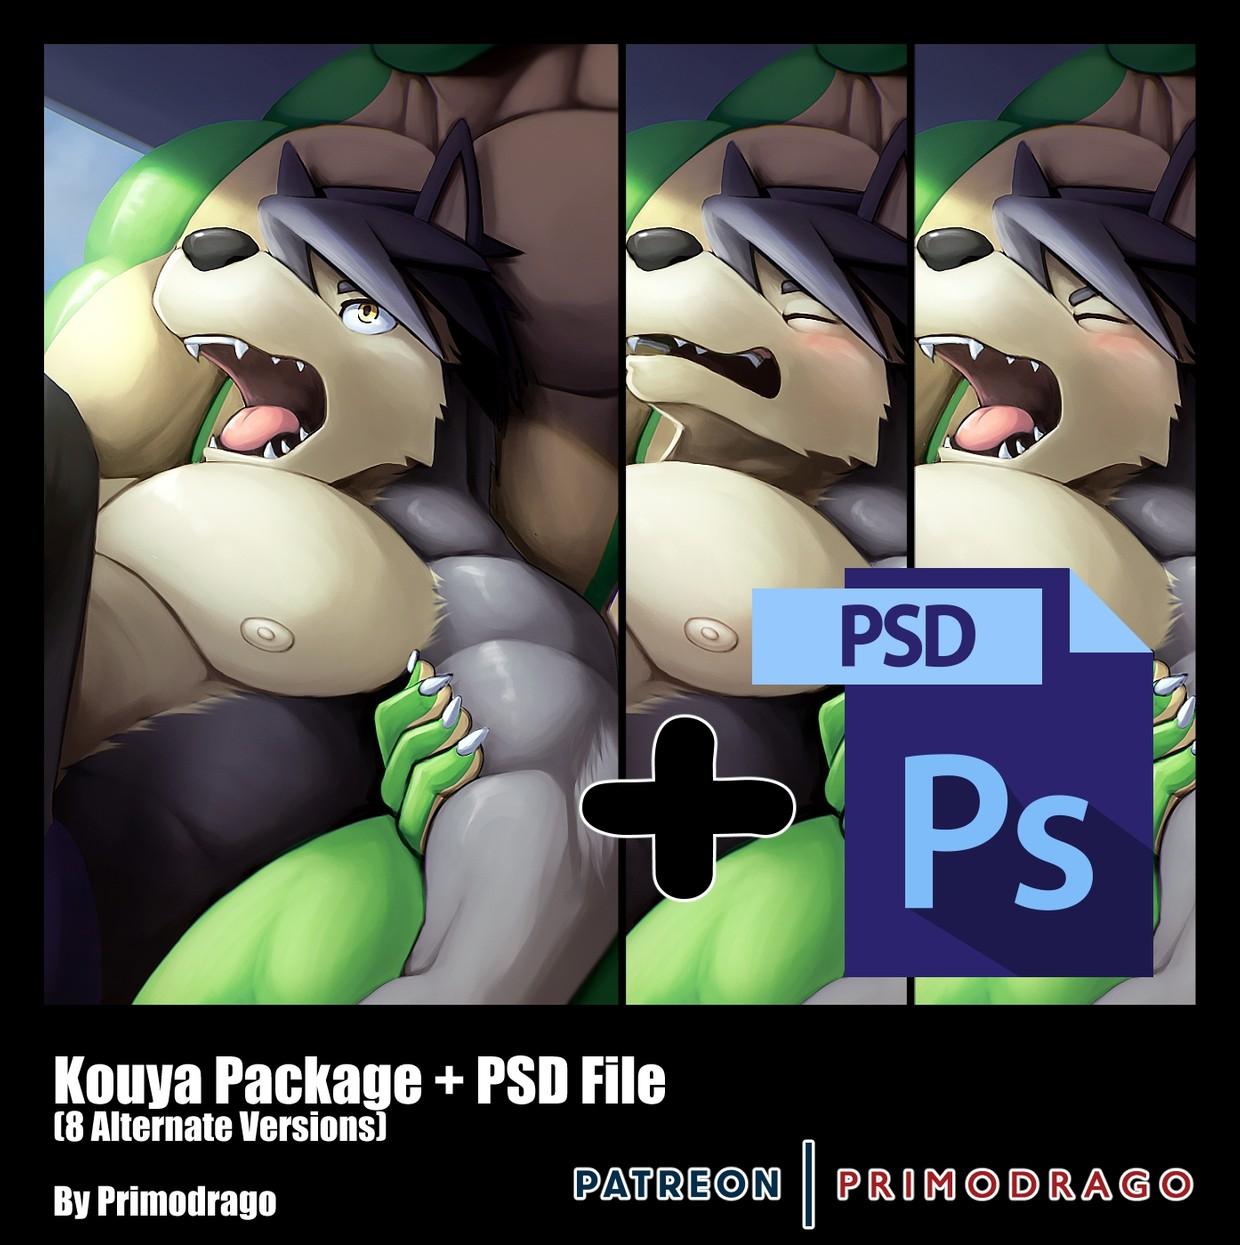 Kouya Artpack + PSD File